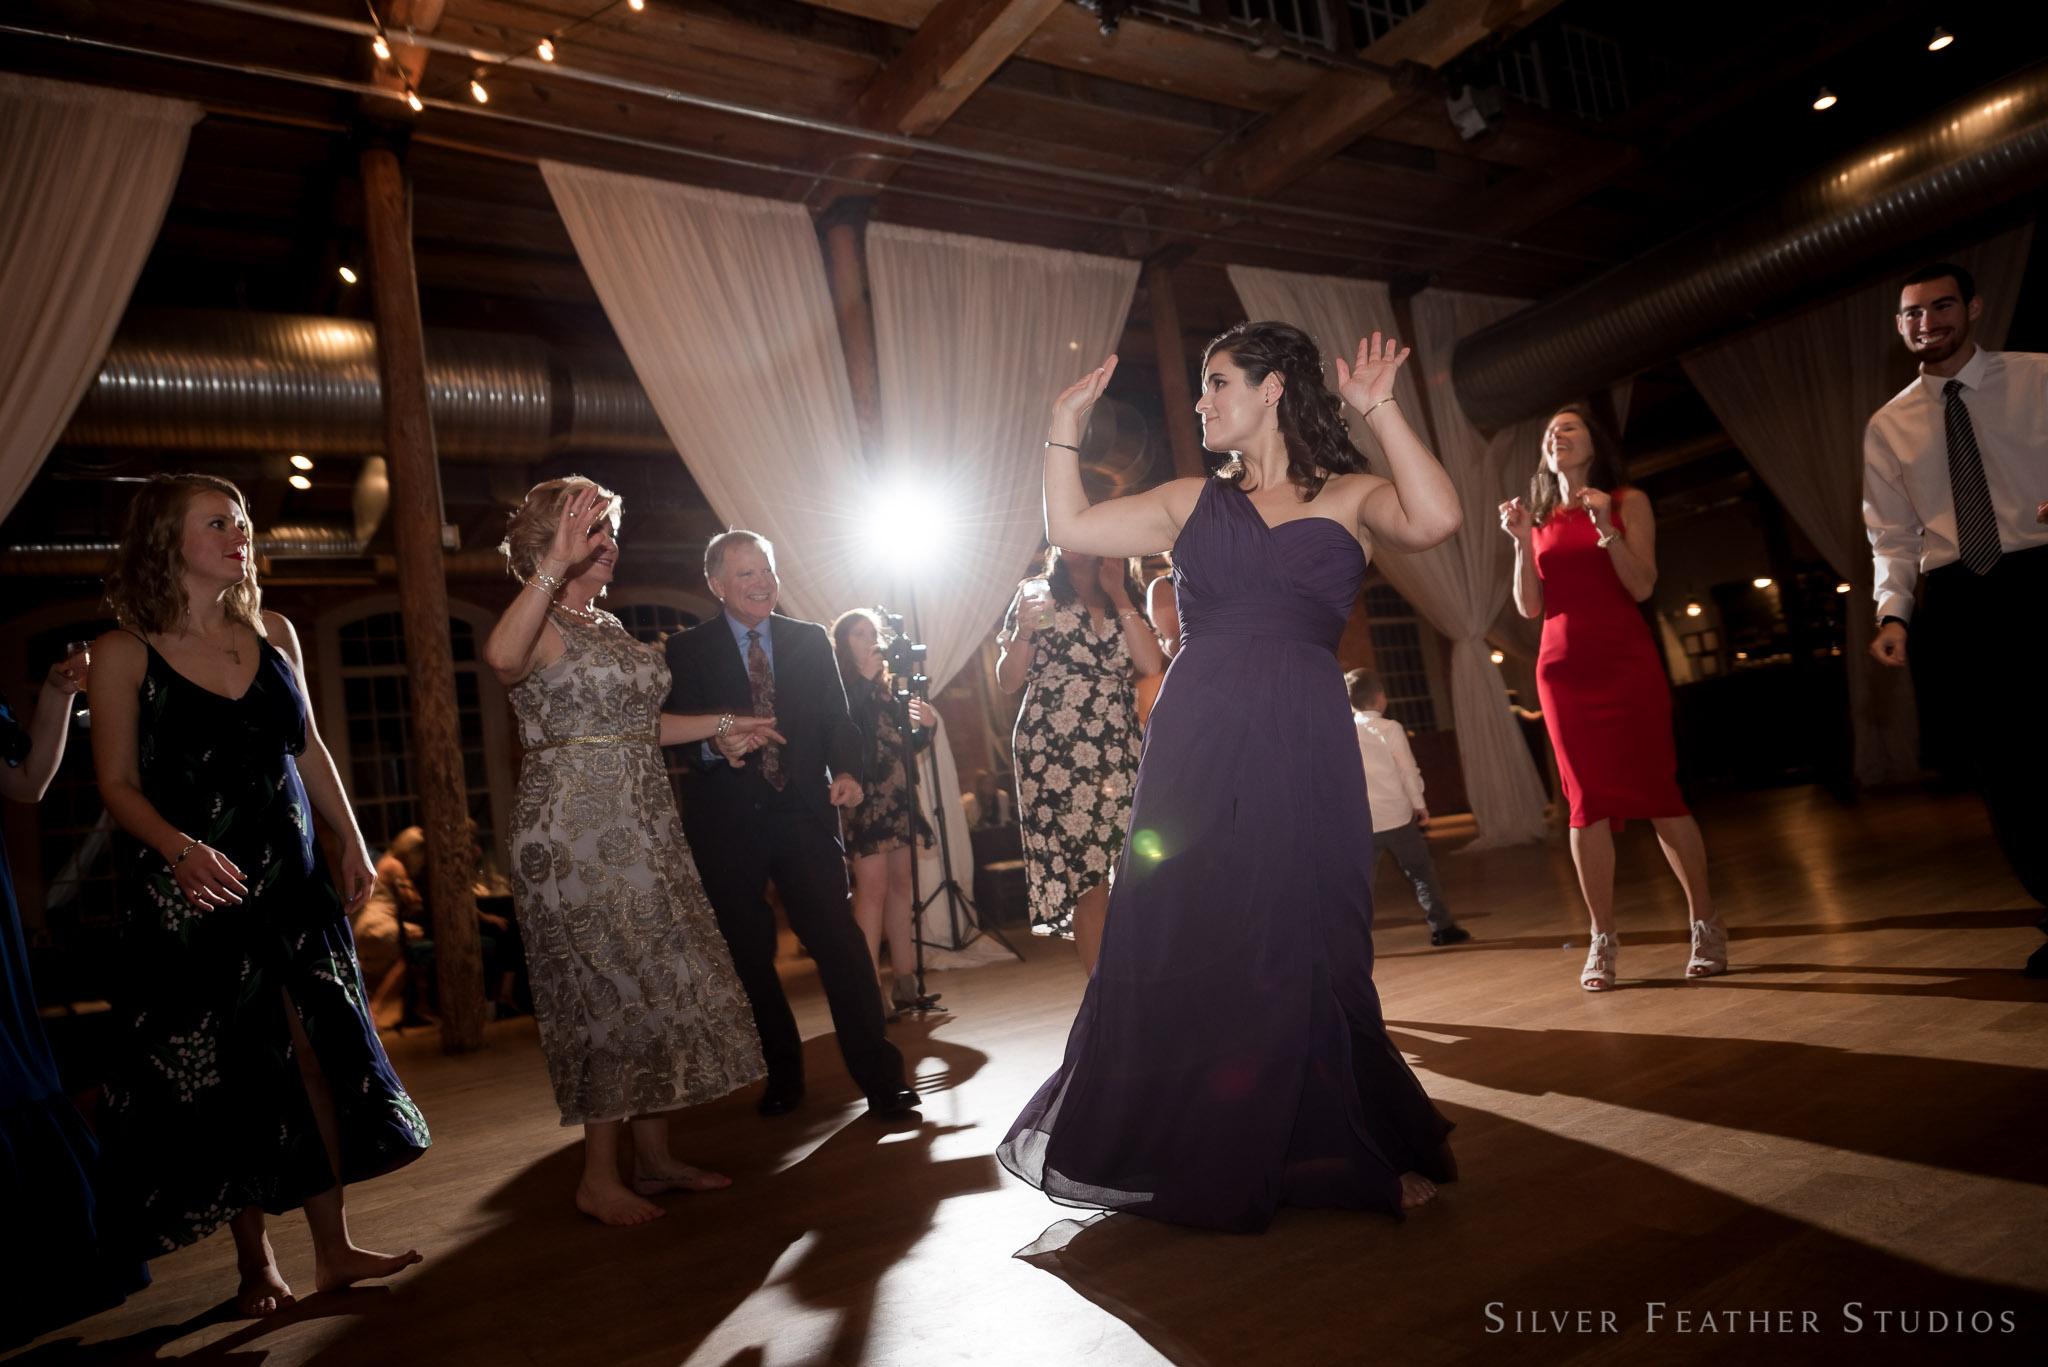 cottom-room-wedding-photography-049.jpg